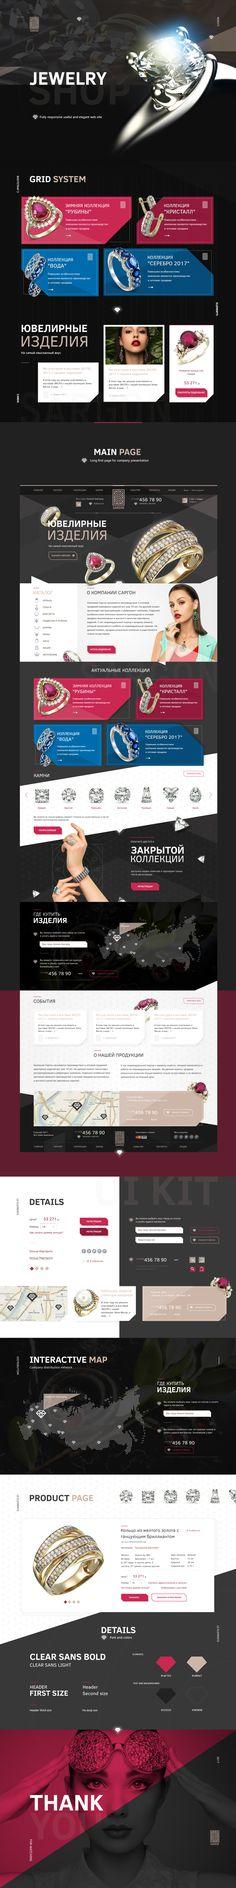 Jewelry Shop, website